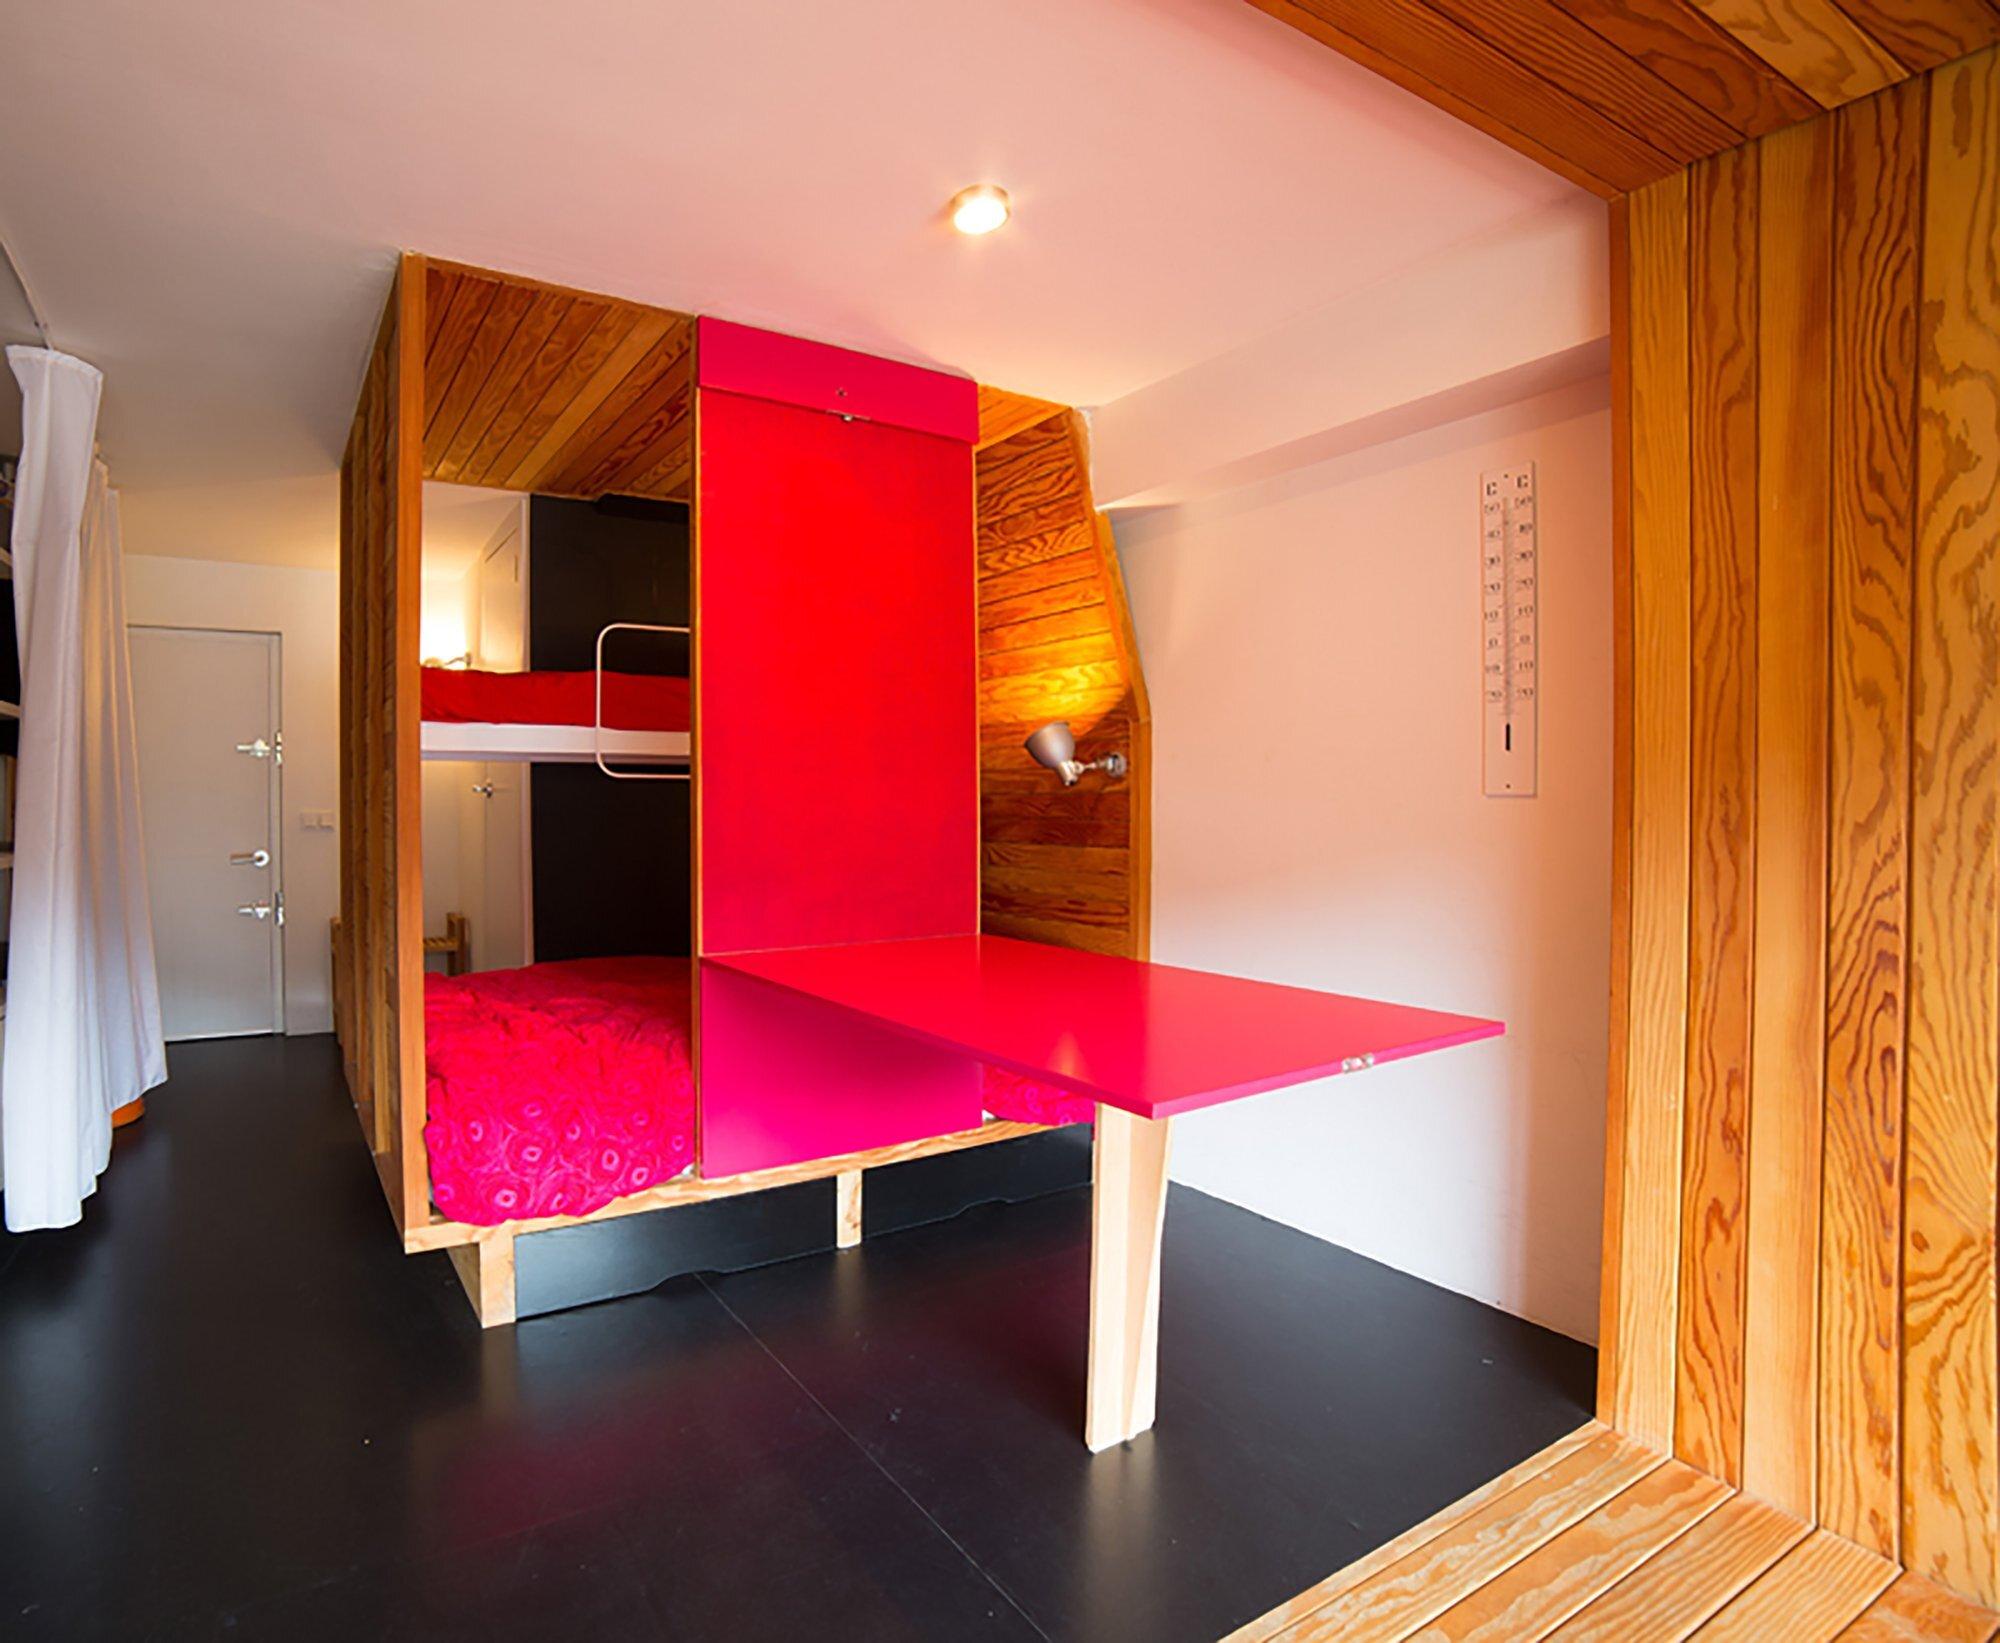 Studio in a Mountain Resort - Beriot Bernardini Arquitectos - Madrid Spain - Dining Table - Humble Homes